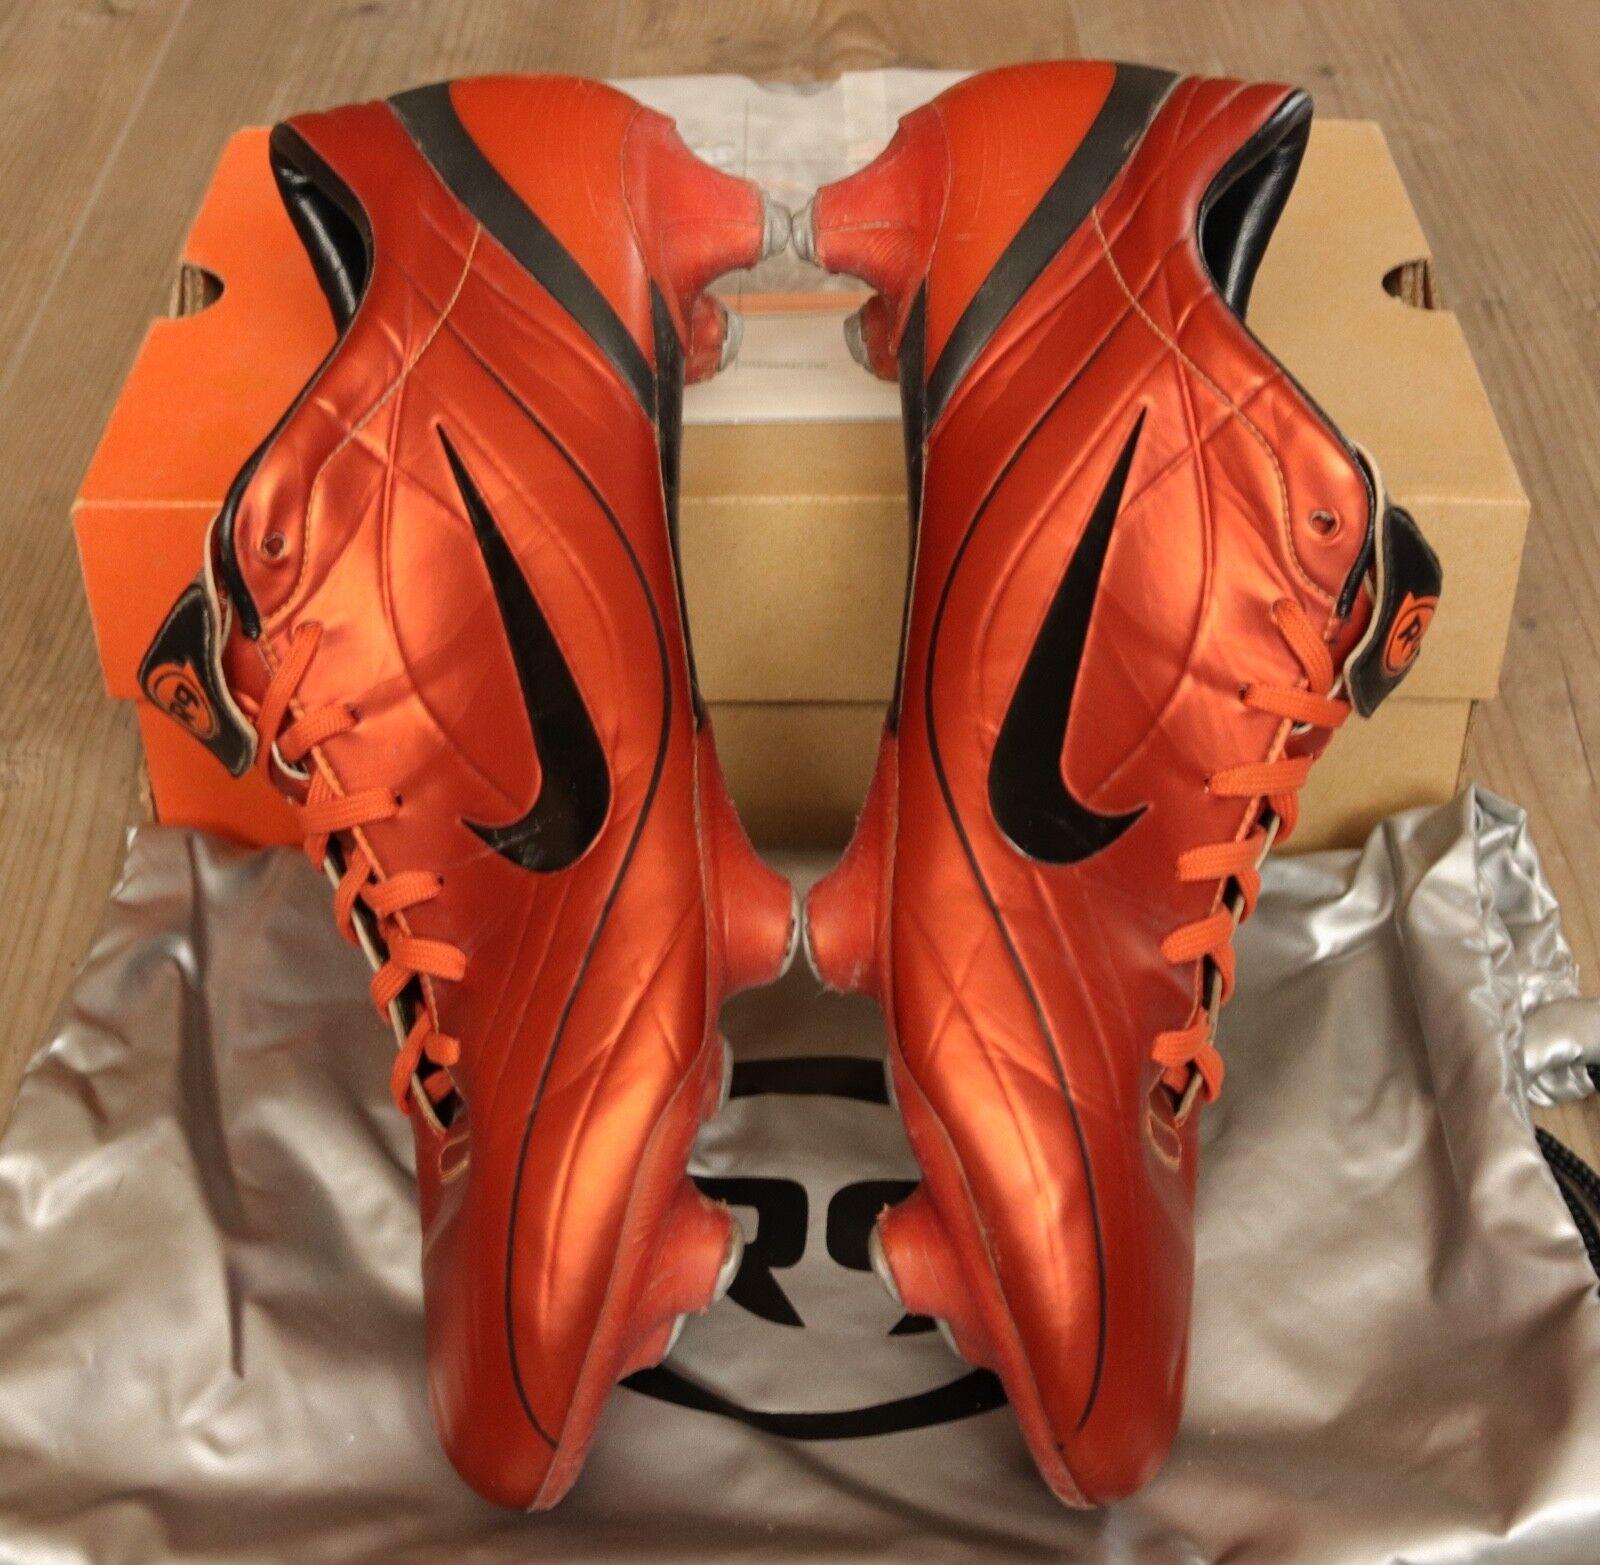 Nike mercurial vapor II sg 47,5 us13 uk12 r9 botas de fútbol súperfly XI Mania SL